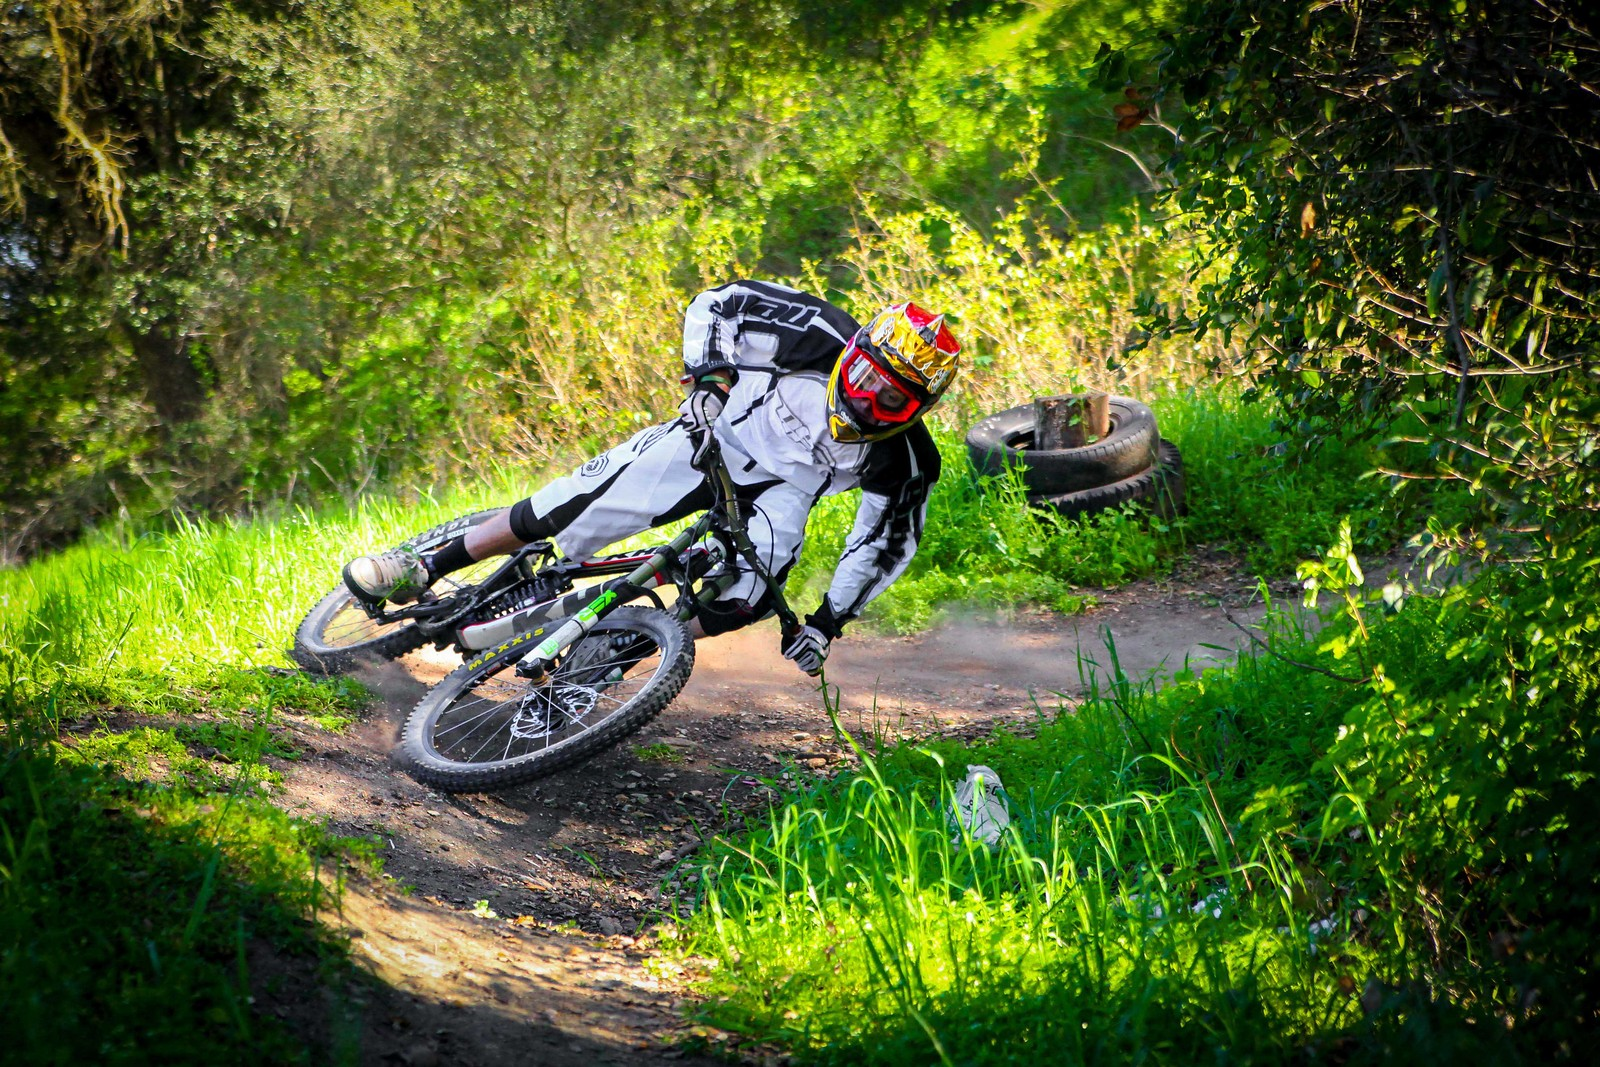 IMG 3103 - GnarHuck - Mountain Biking Pictures - Vital MTB